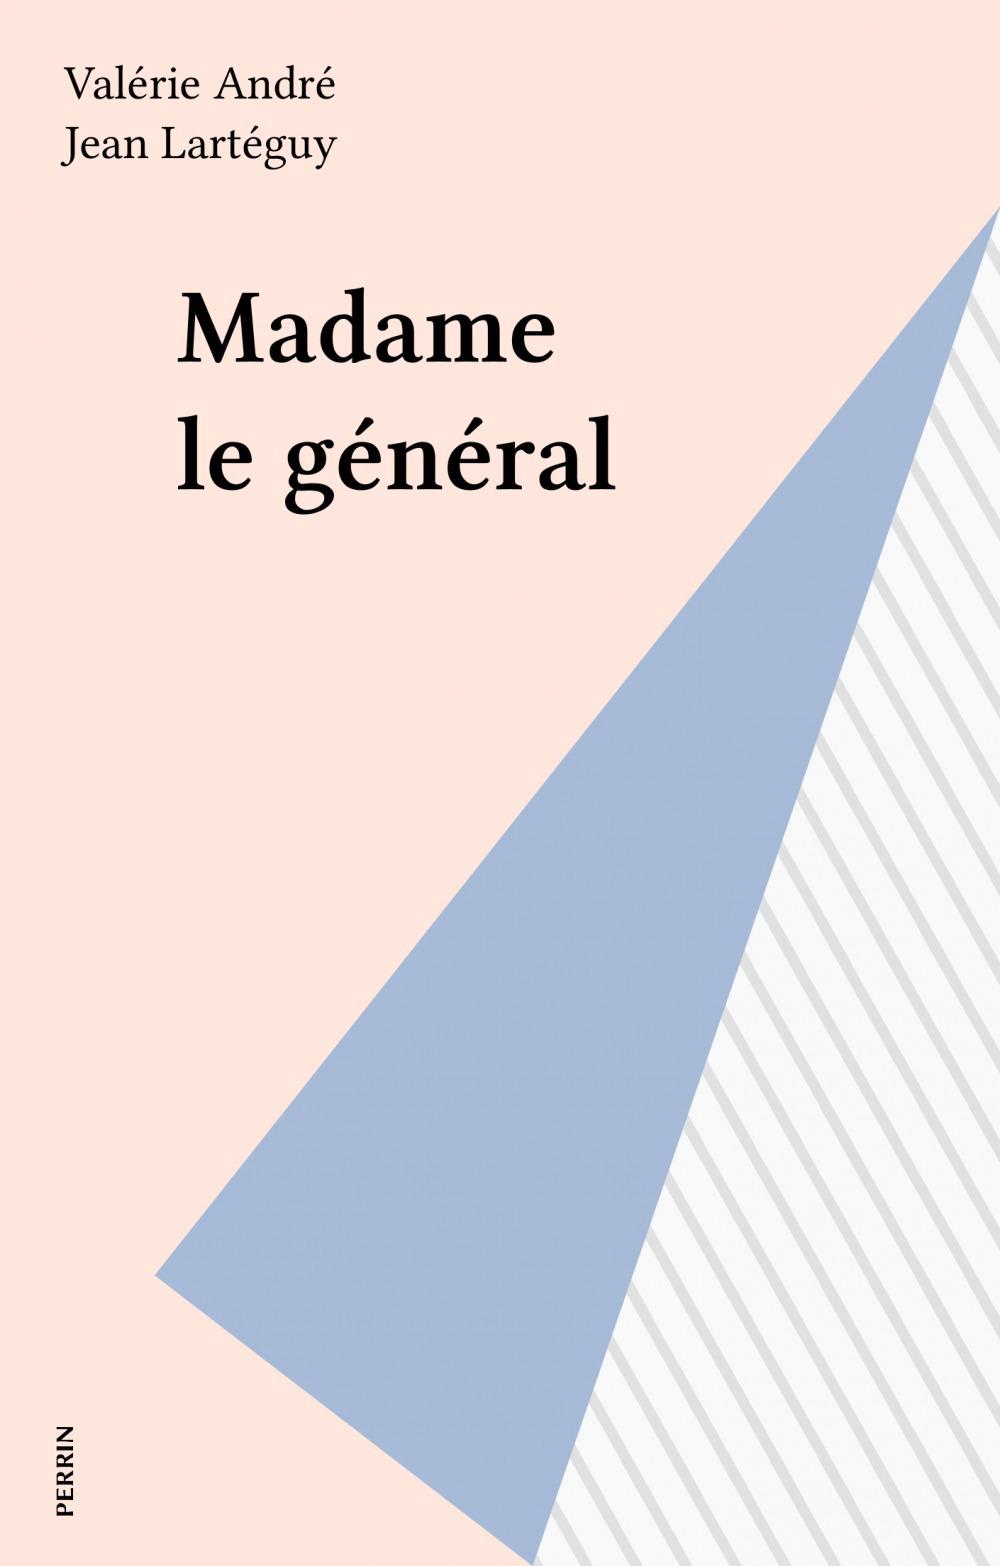 Madame le general